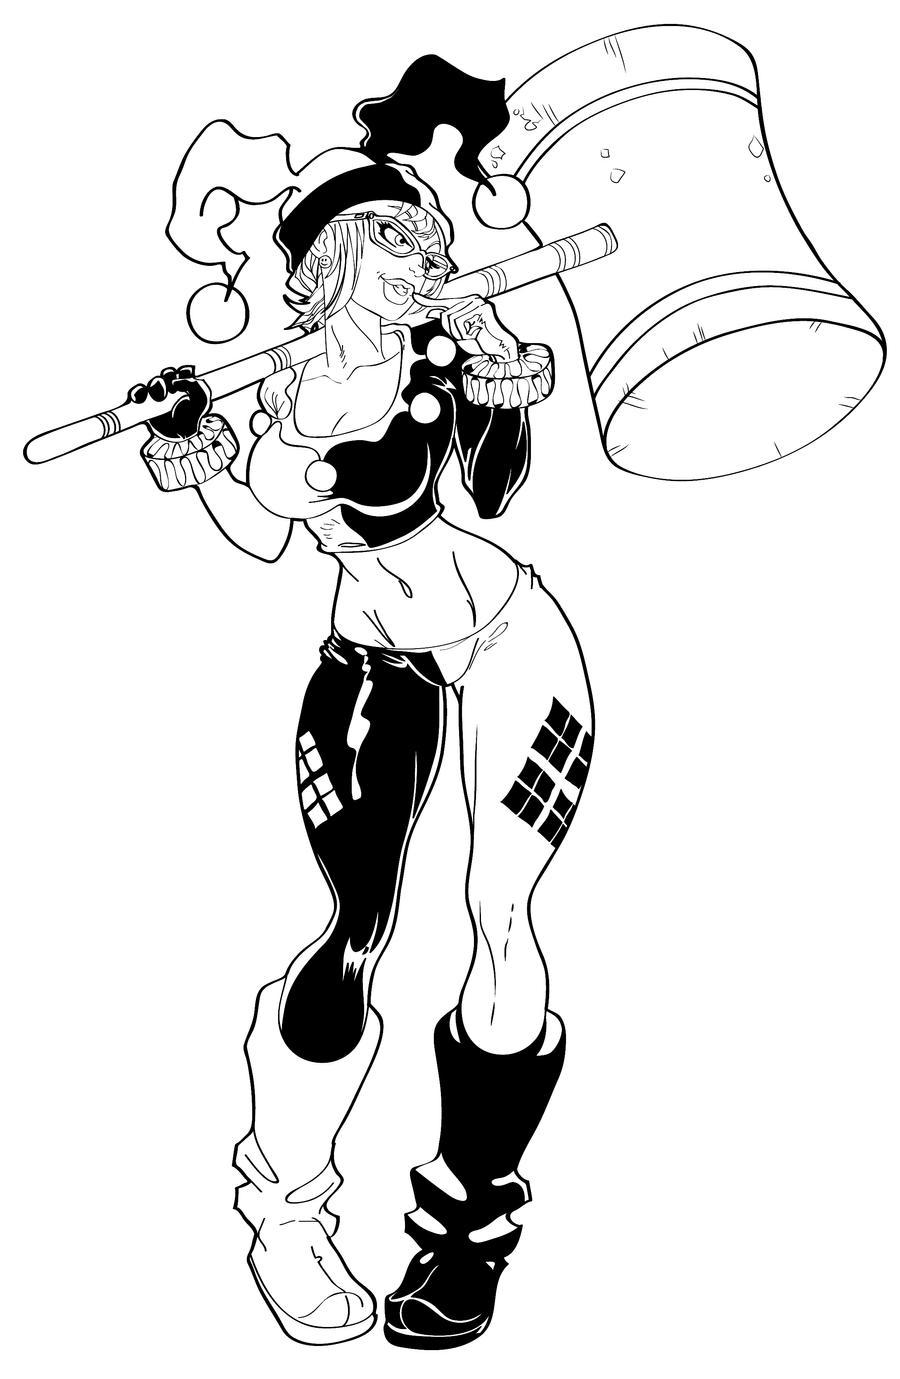 Harley quinn printable coloring pages - Harley Quinn Inks By Tracywong Harley Quinn Inks By Tracywong